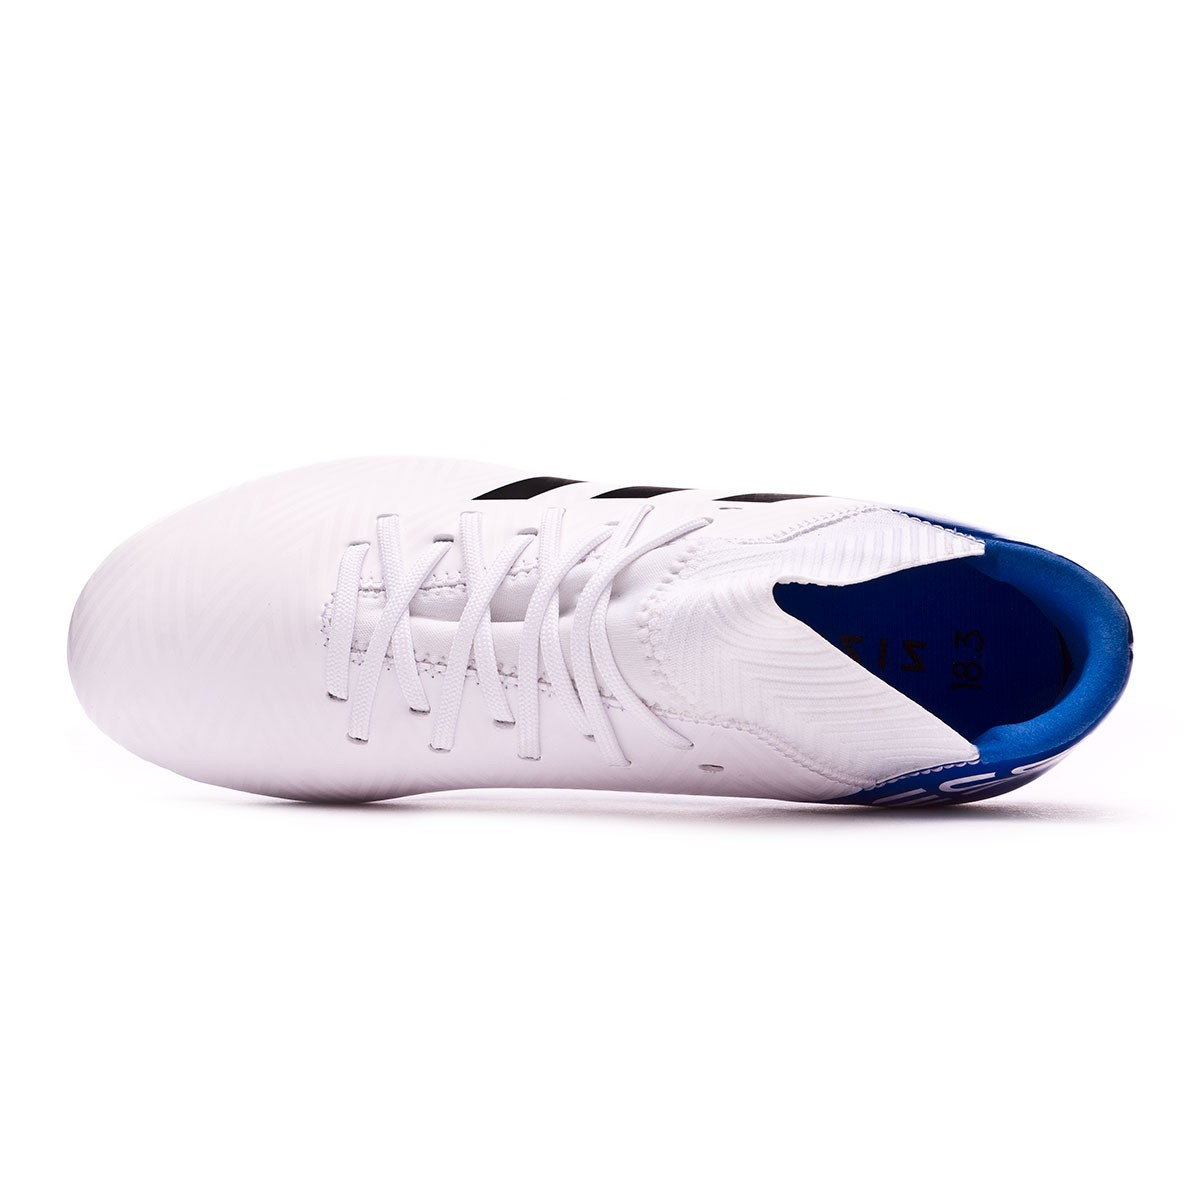 a7c3e22a6 Football Boots adidas Kids Nemeziz Messi 18.3 FG White-Core black-Football  blue Niño - Football store Fútbol Emotion